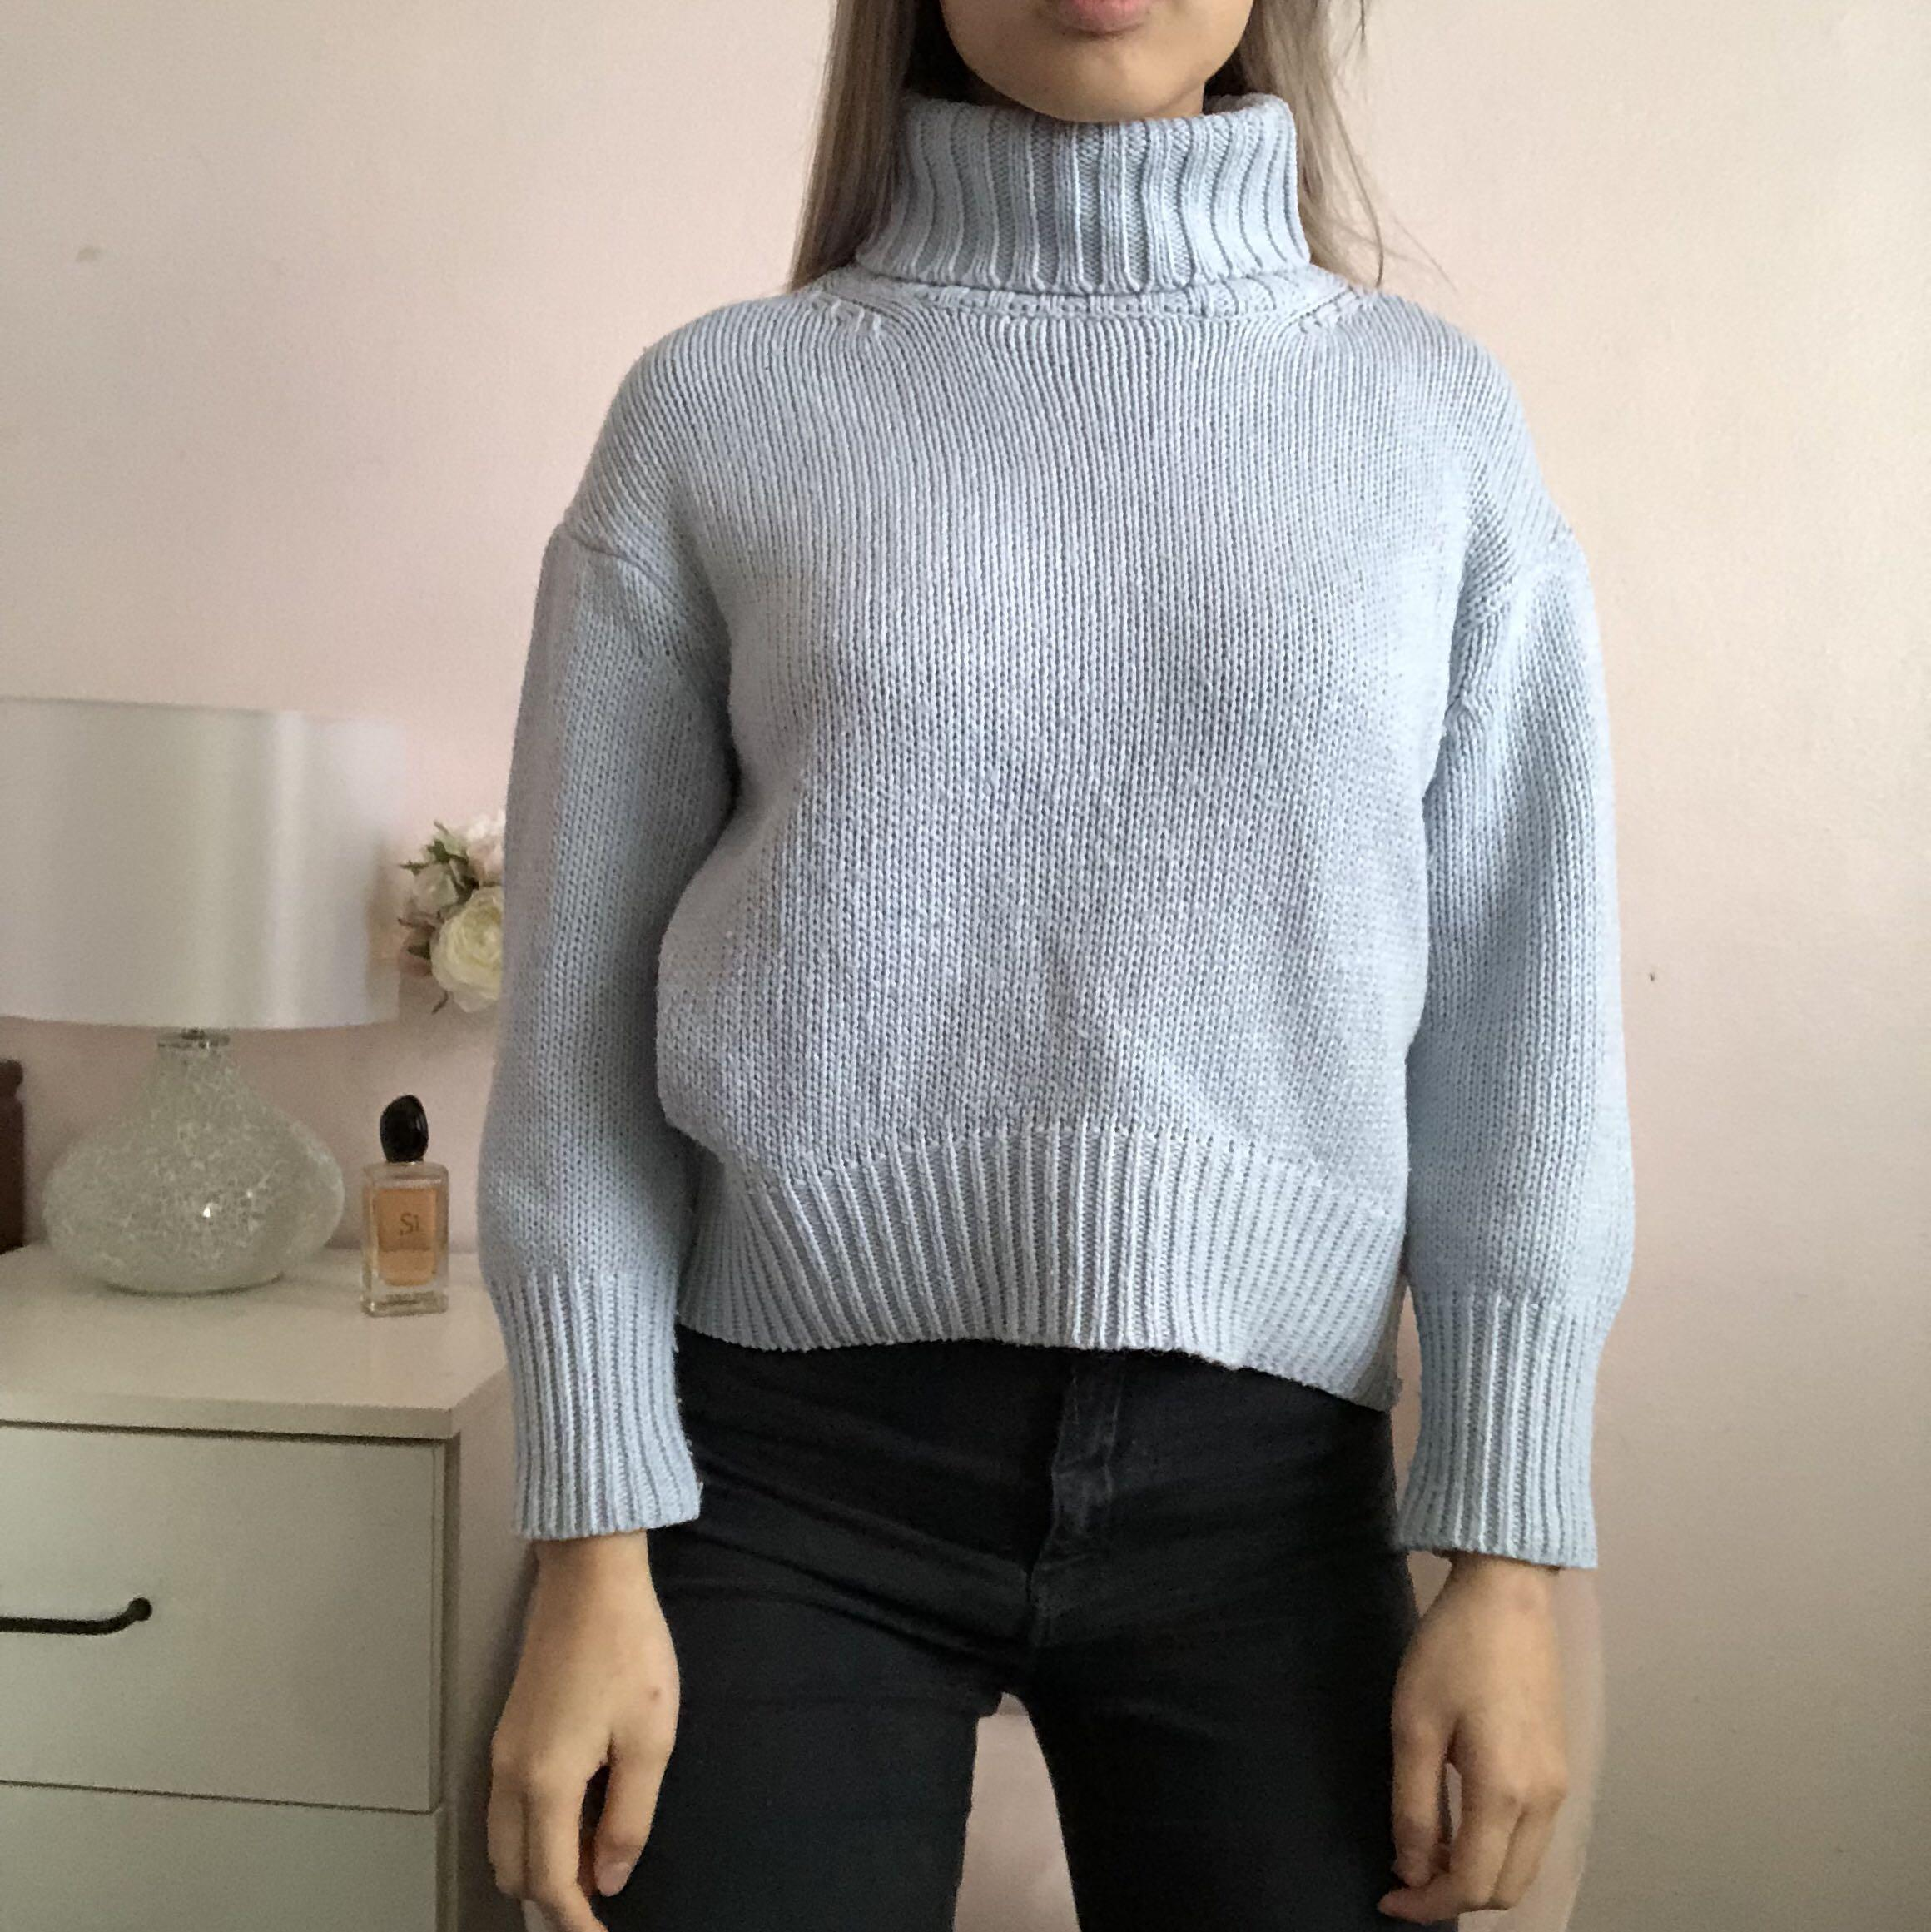 Baby Blue Turtleneck Knit Jumper Sweater